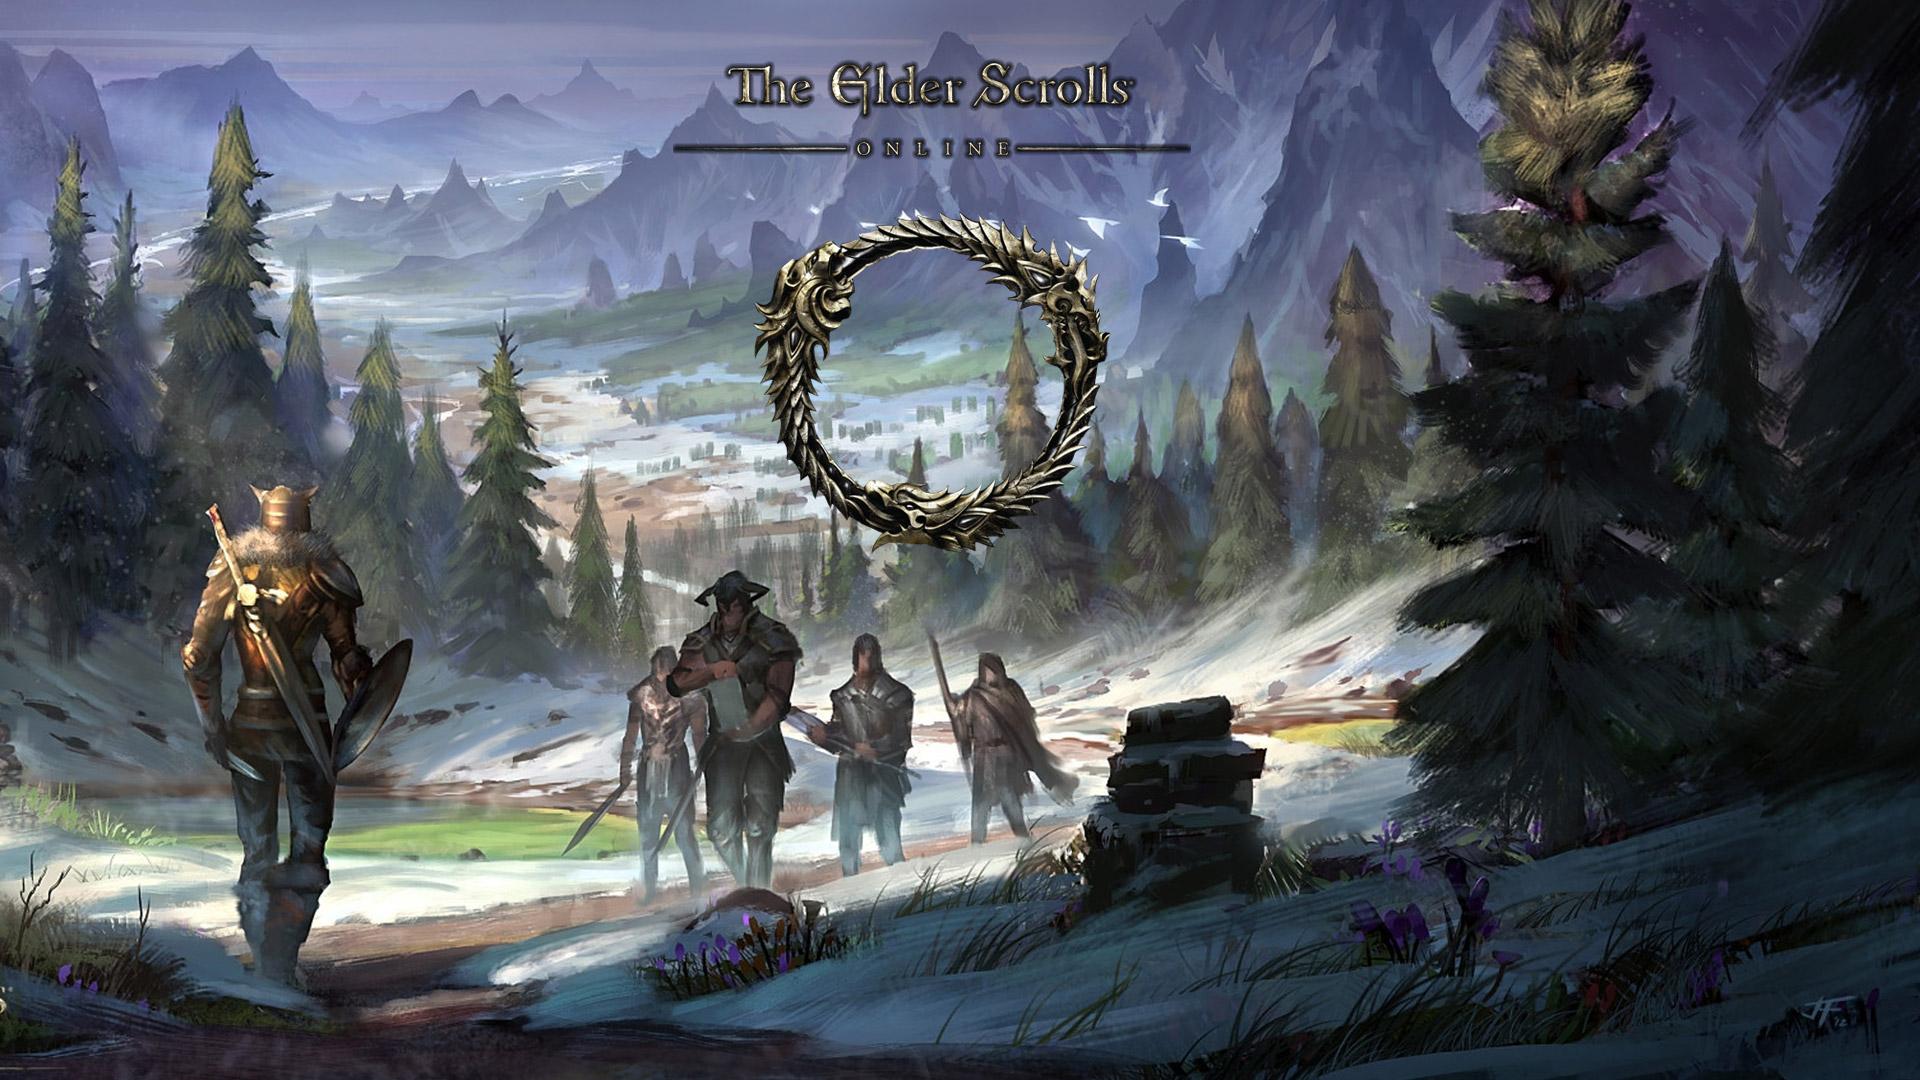 The Elder Scrolls Online wallpaper 7 1920x1080